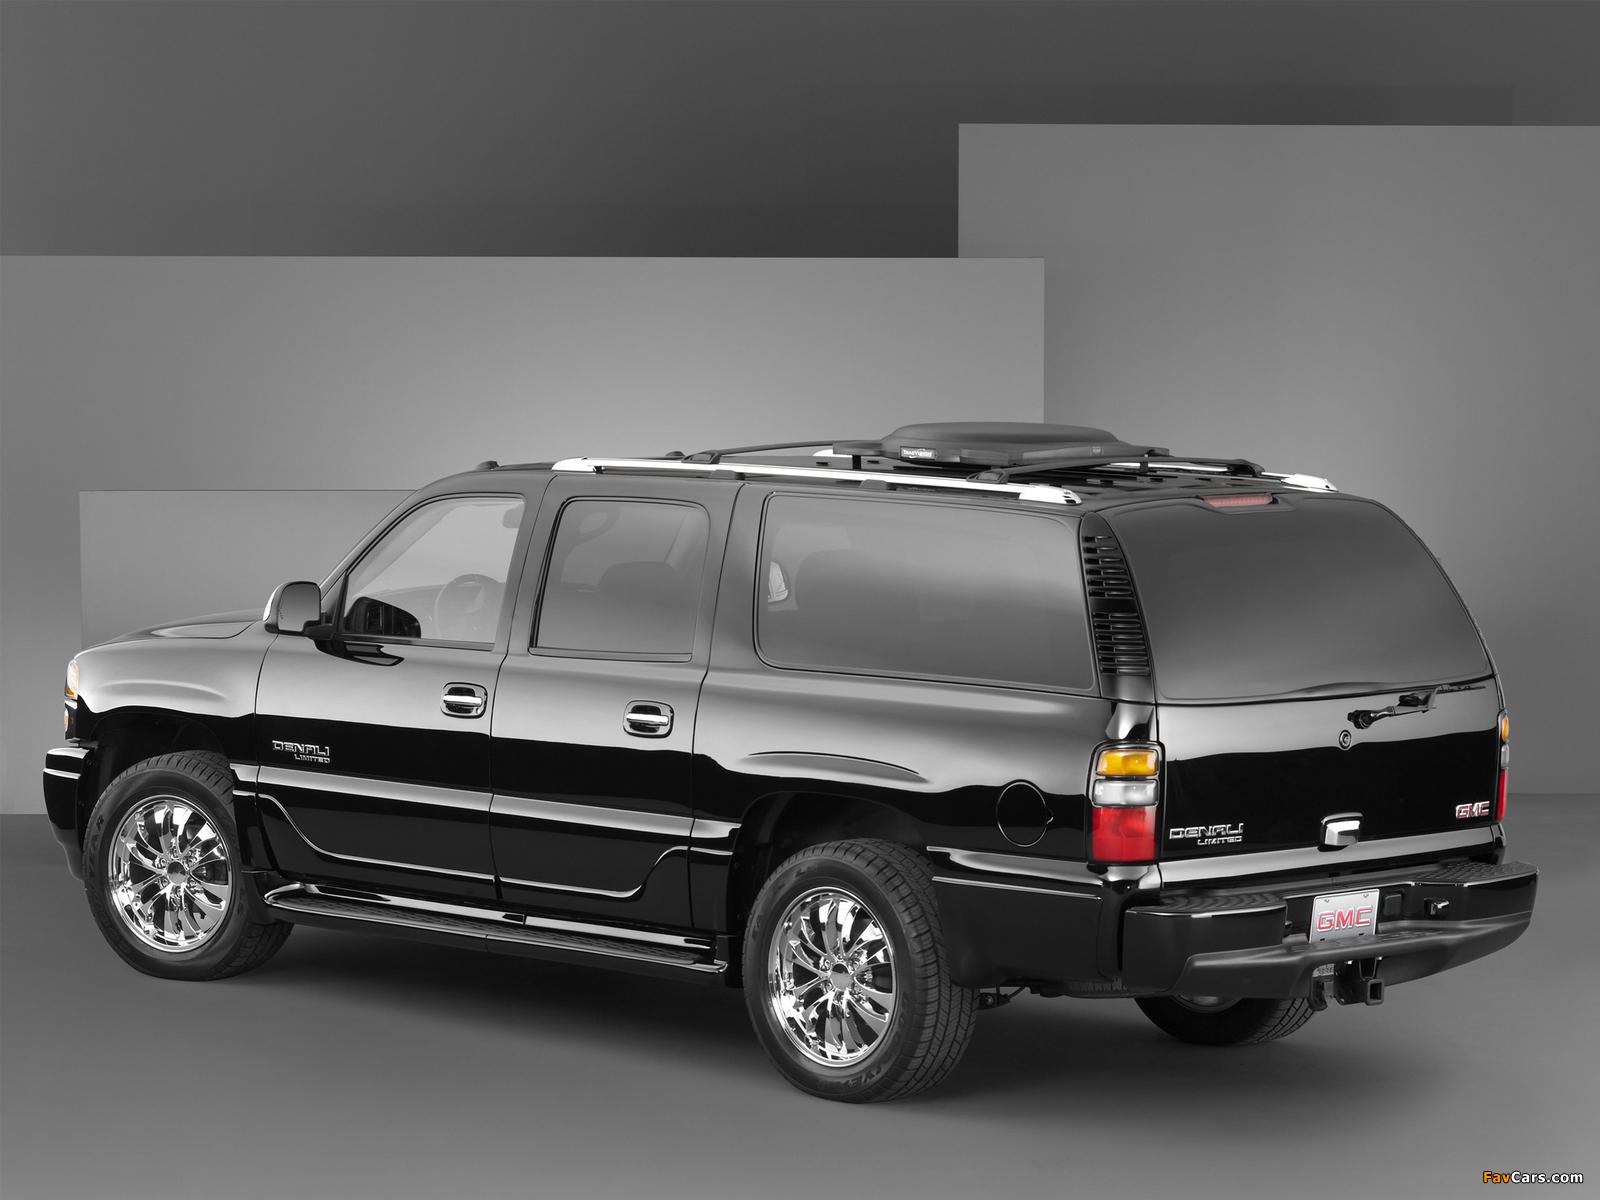 GMC Yukon XL Denali Limited Edition Concept 2004 photos (1600 x 1200)